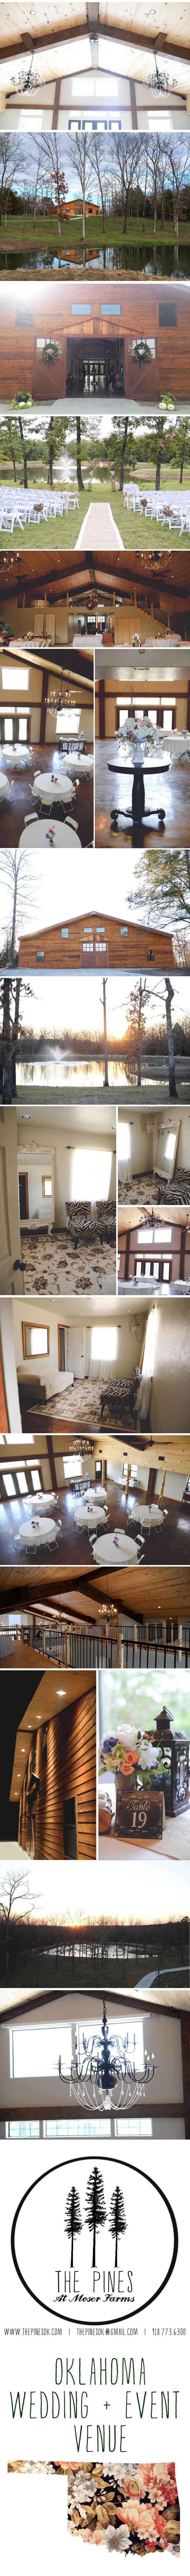 lake dsc cabins tenkiller s cookson real listings hickory lane cochran estate